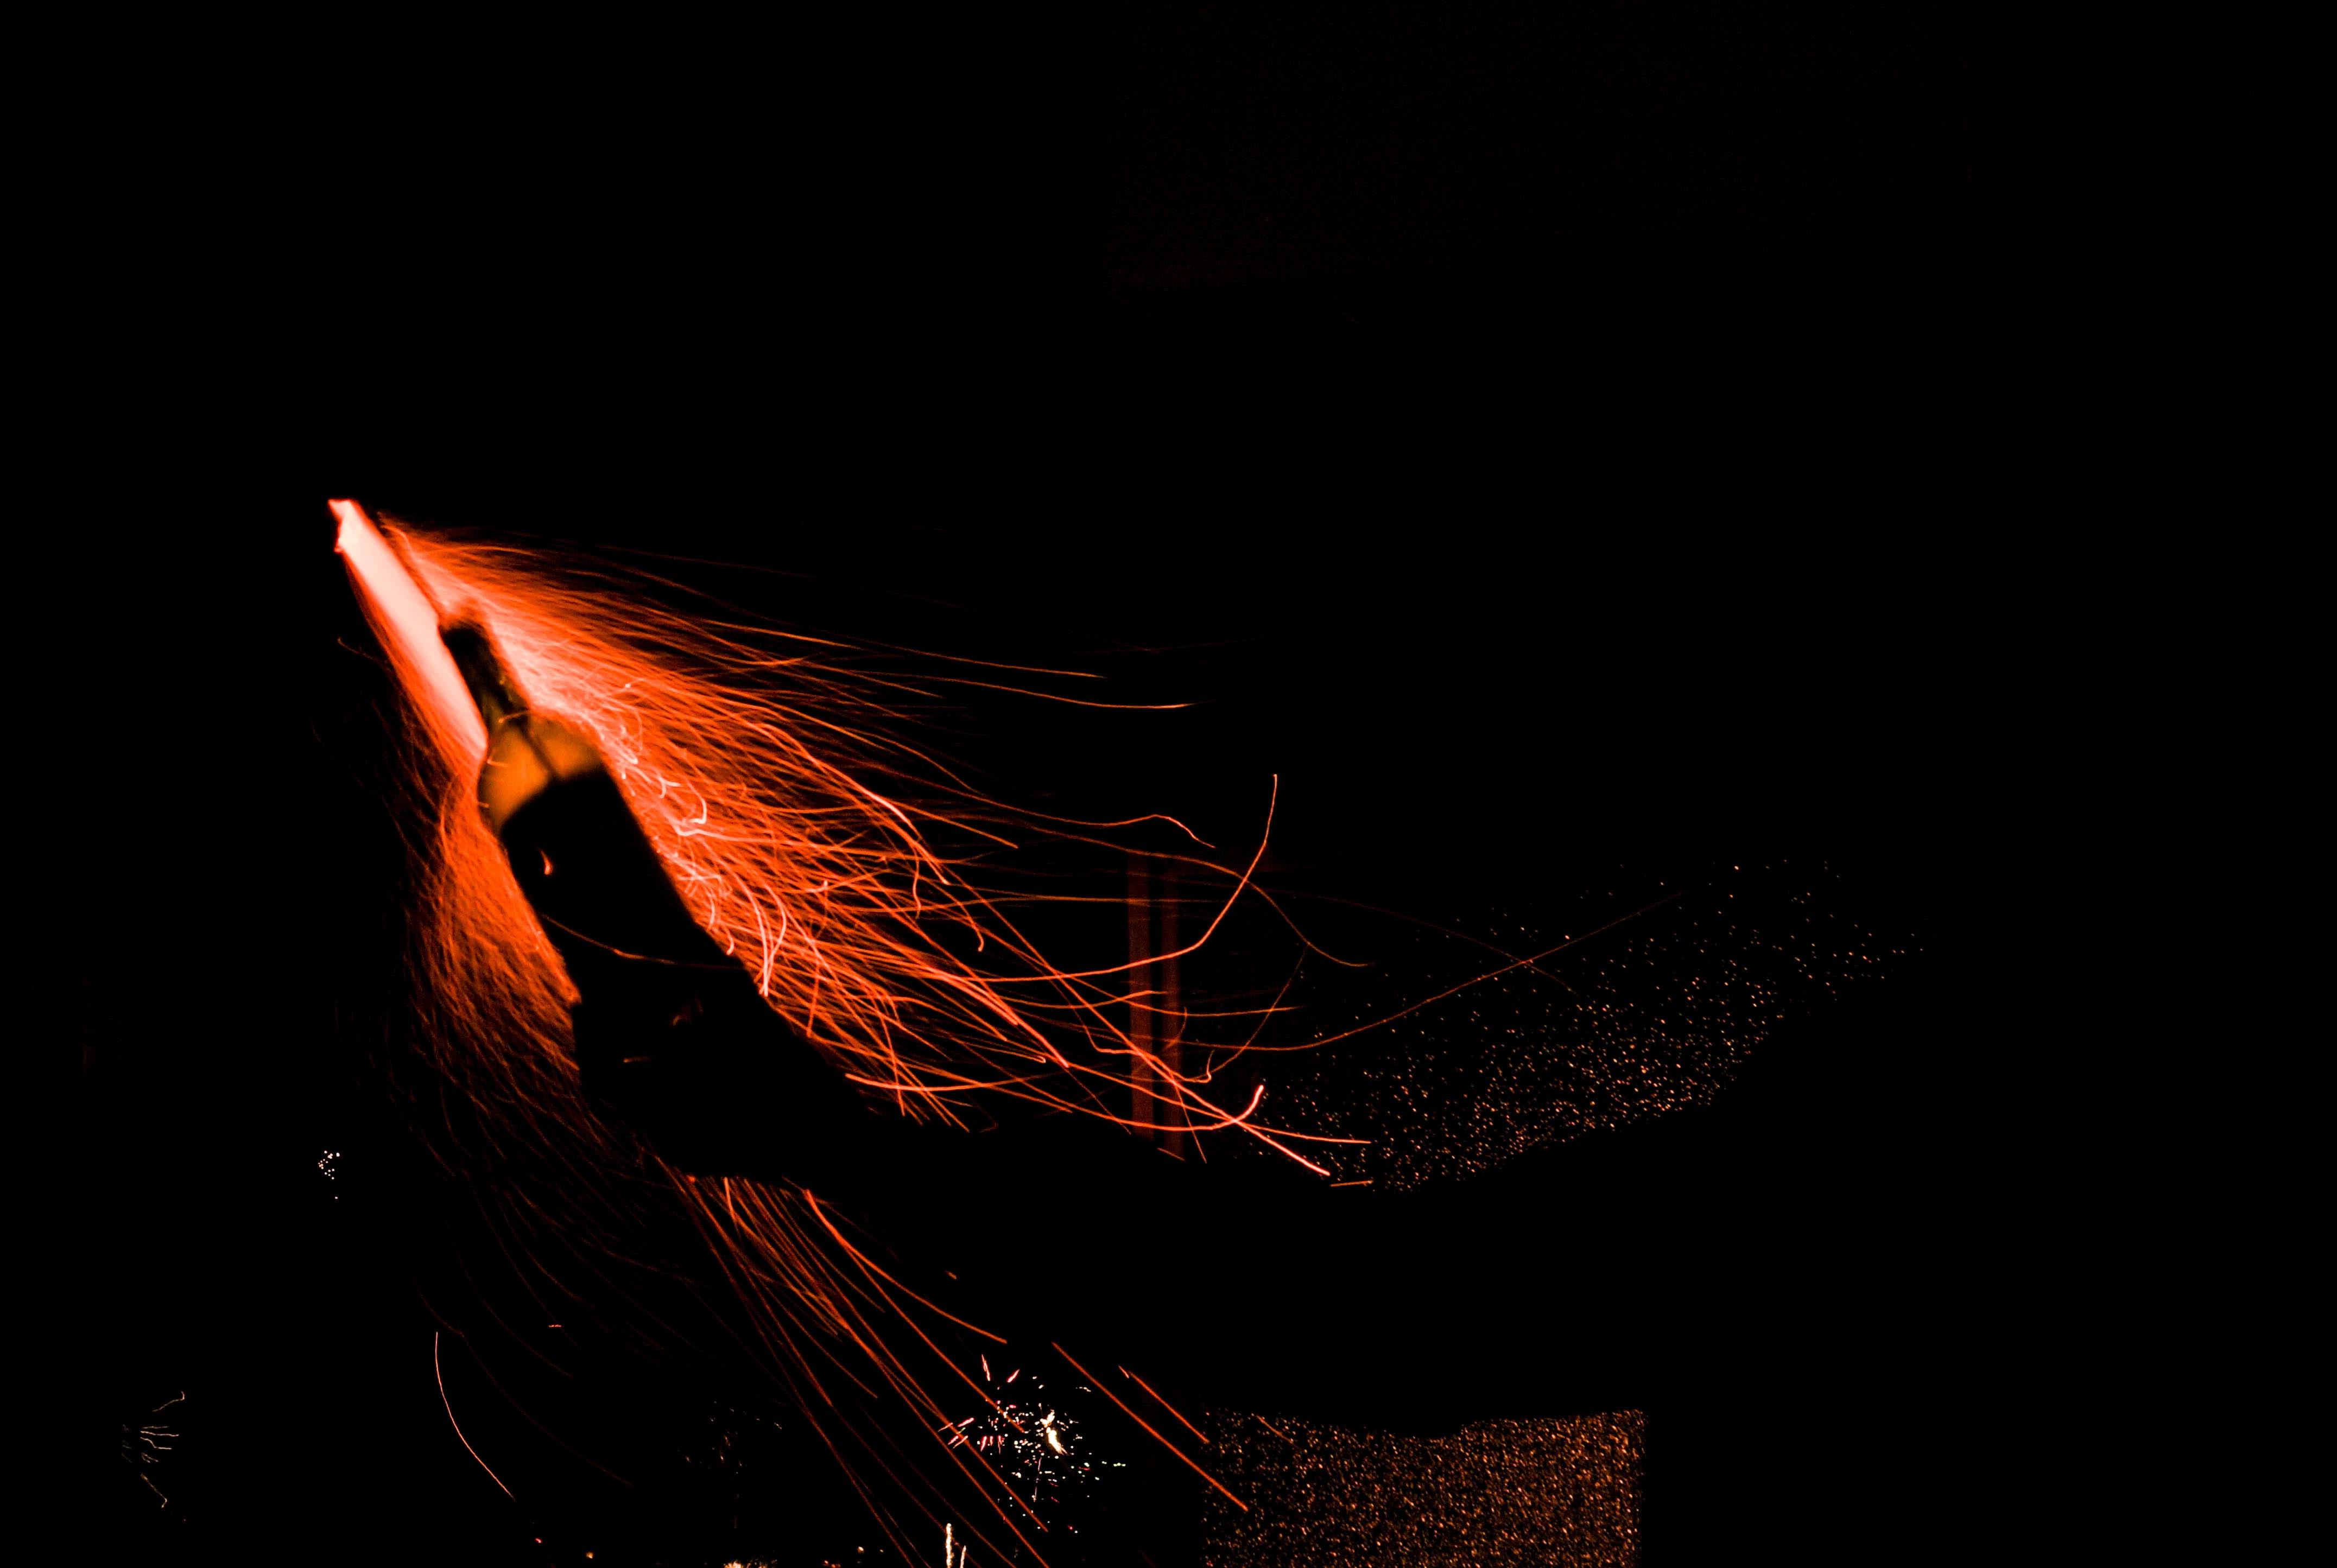 Gambar cahaya malam kembang api perayaan liburan kegelapan cahaya malam kembang api perayaan malam liburan api kegelapan tahun baru roket screenshot komputer wallpaper fenomena voltagebd Images